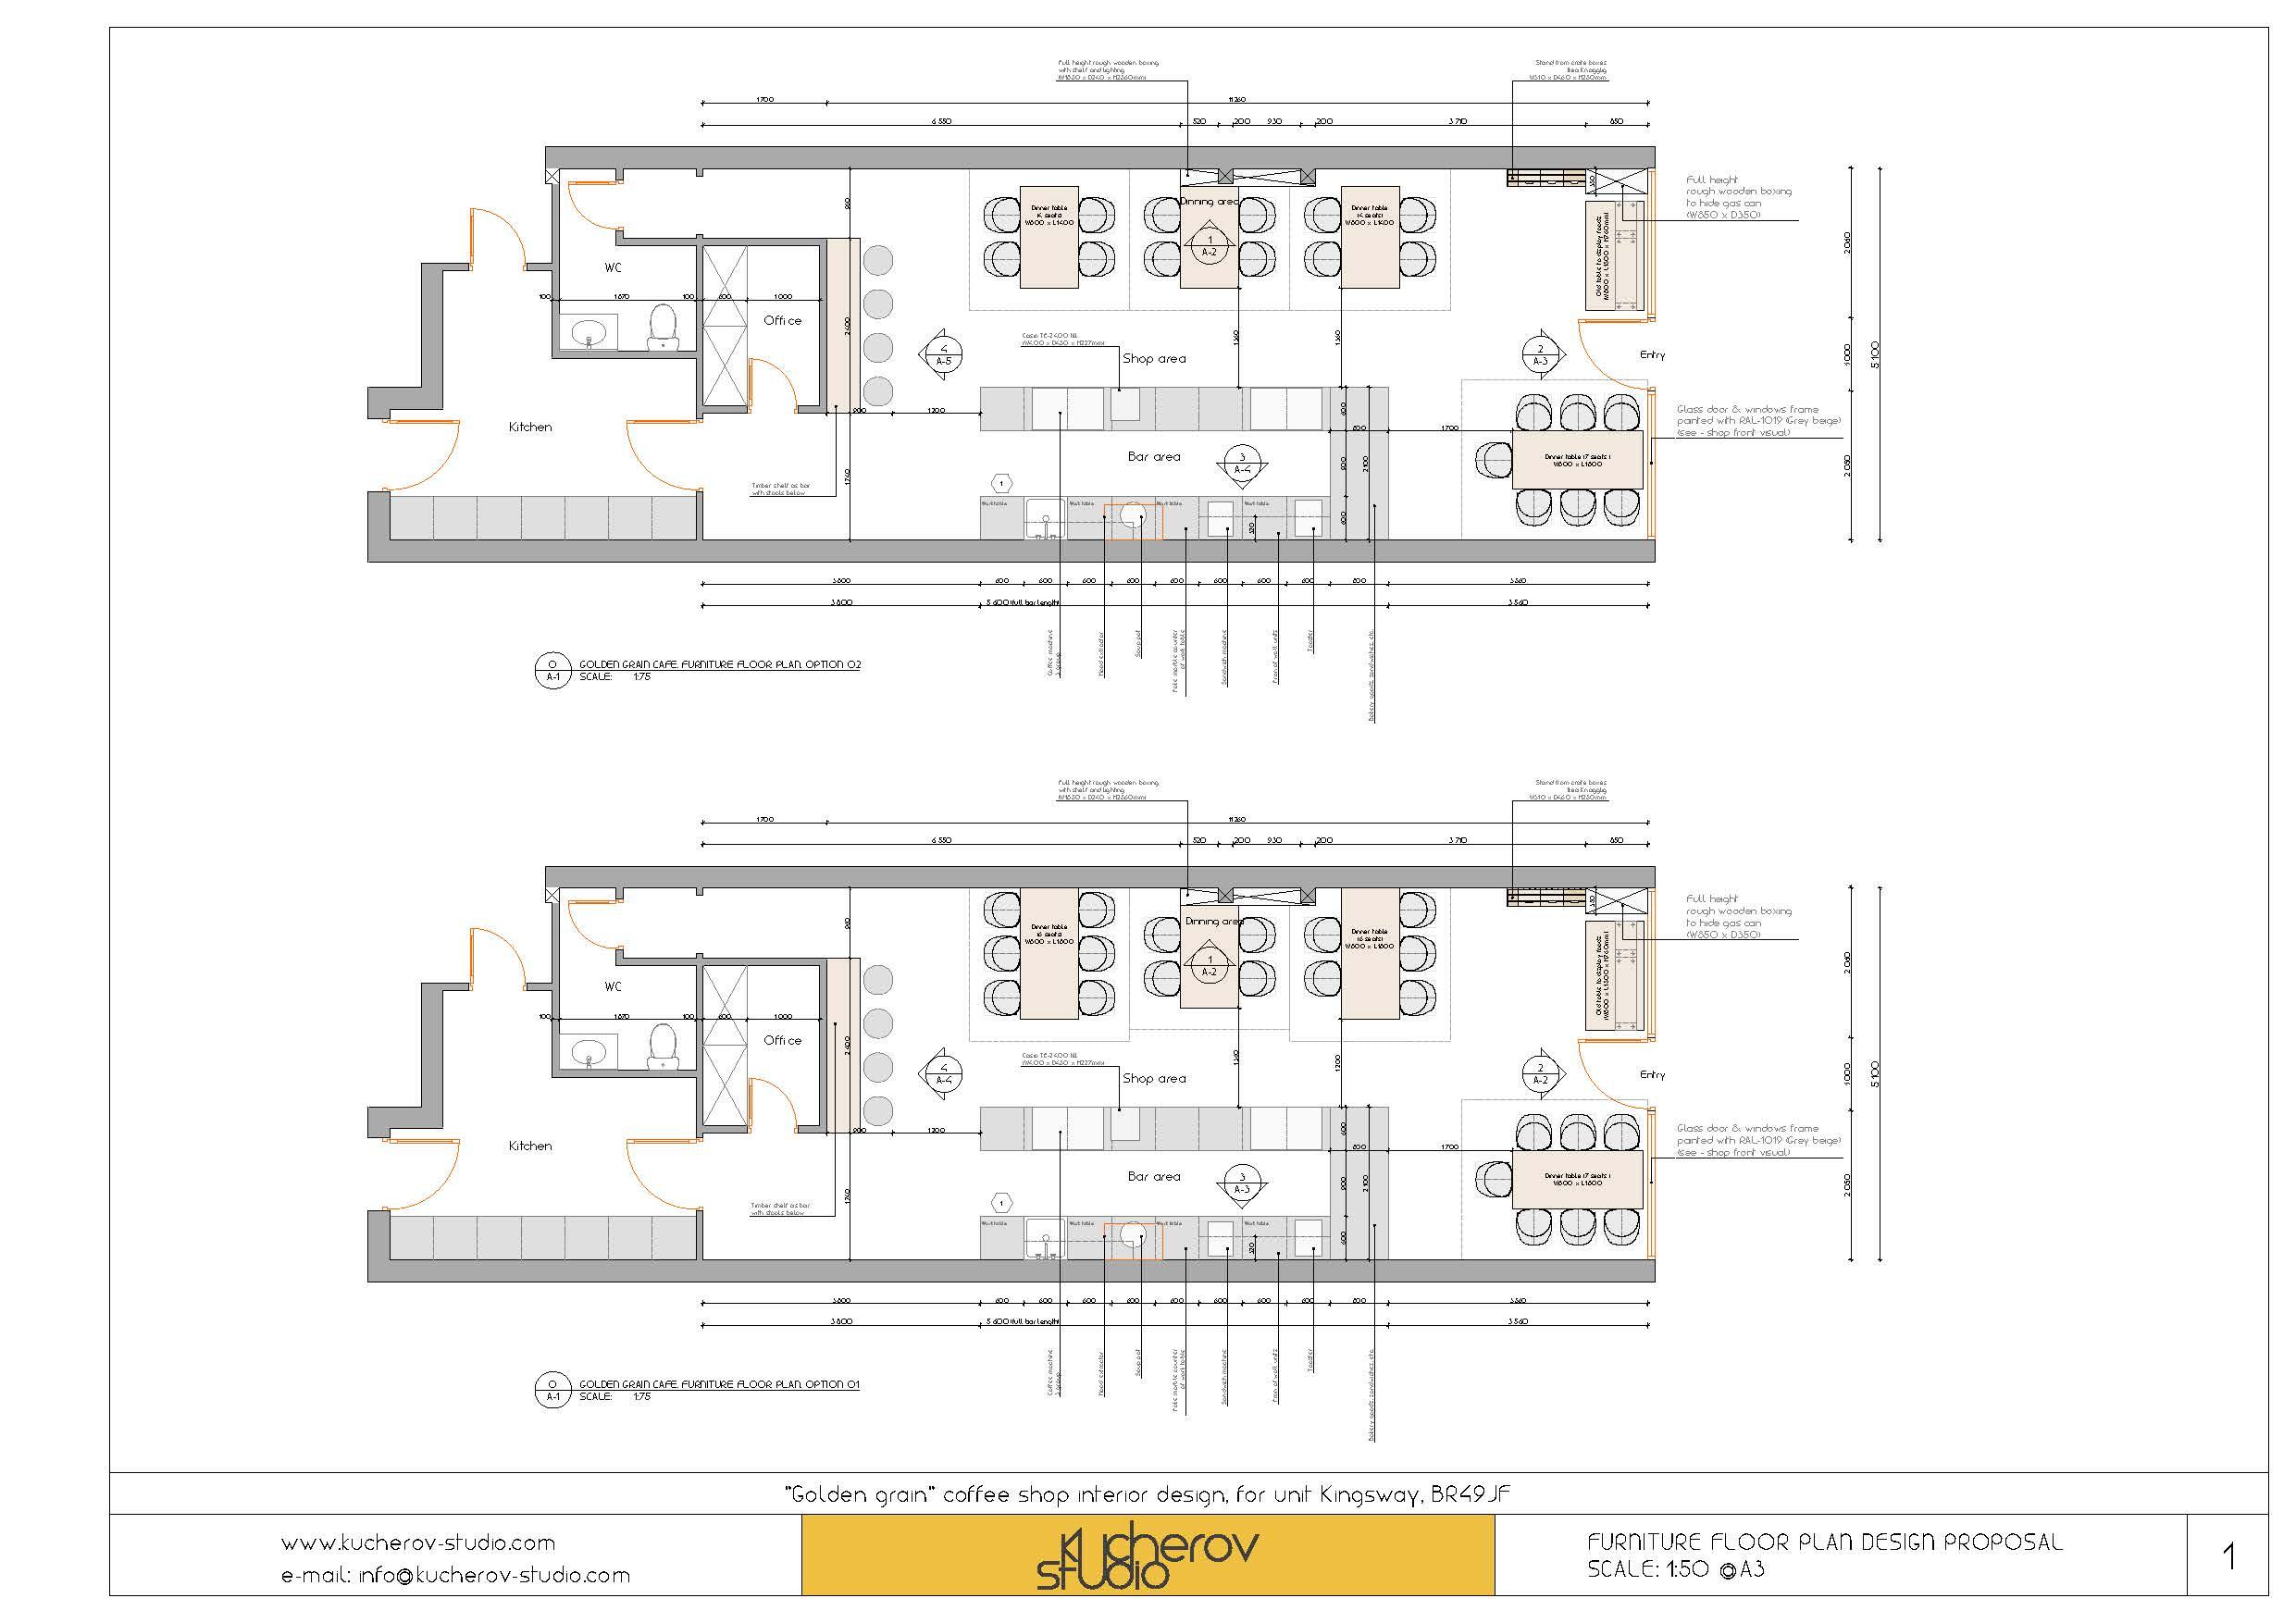 Kucherov Studio Architectural Visualisation